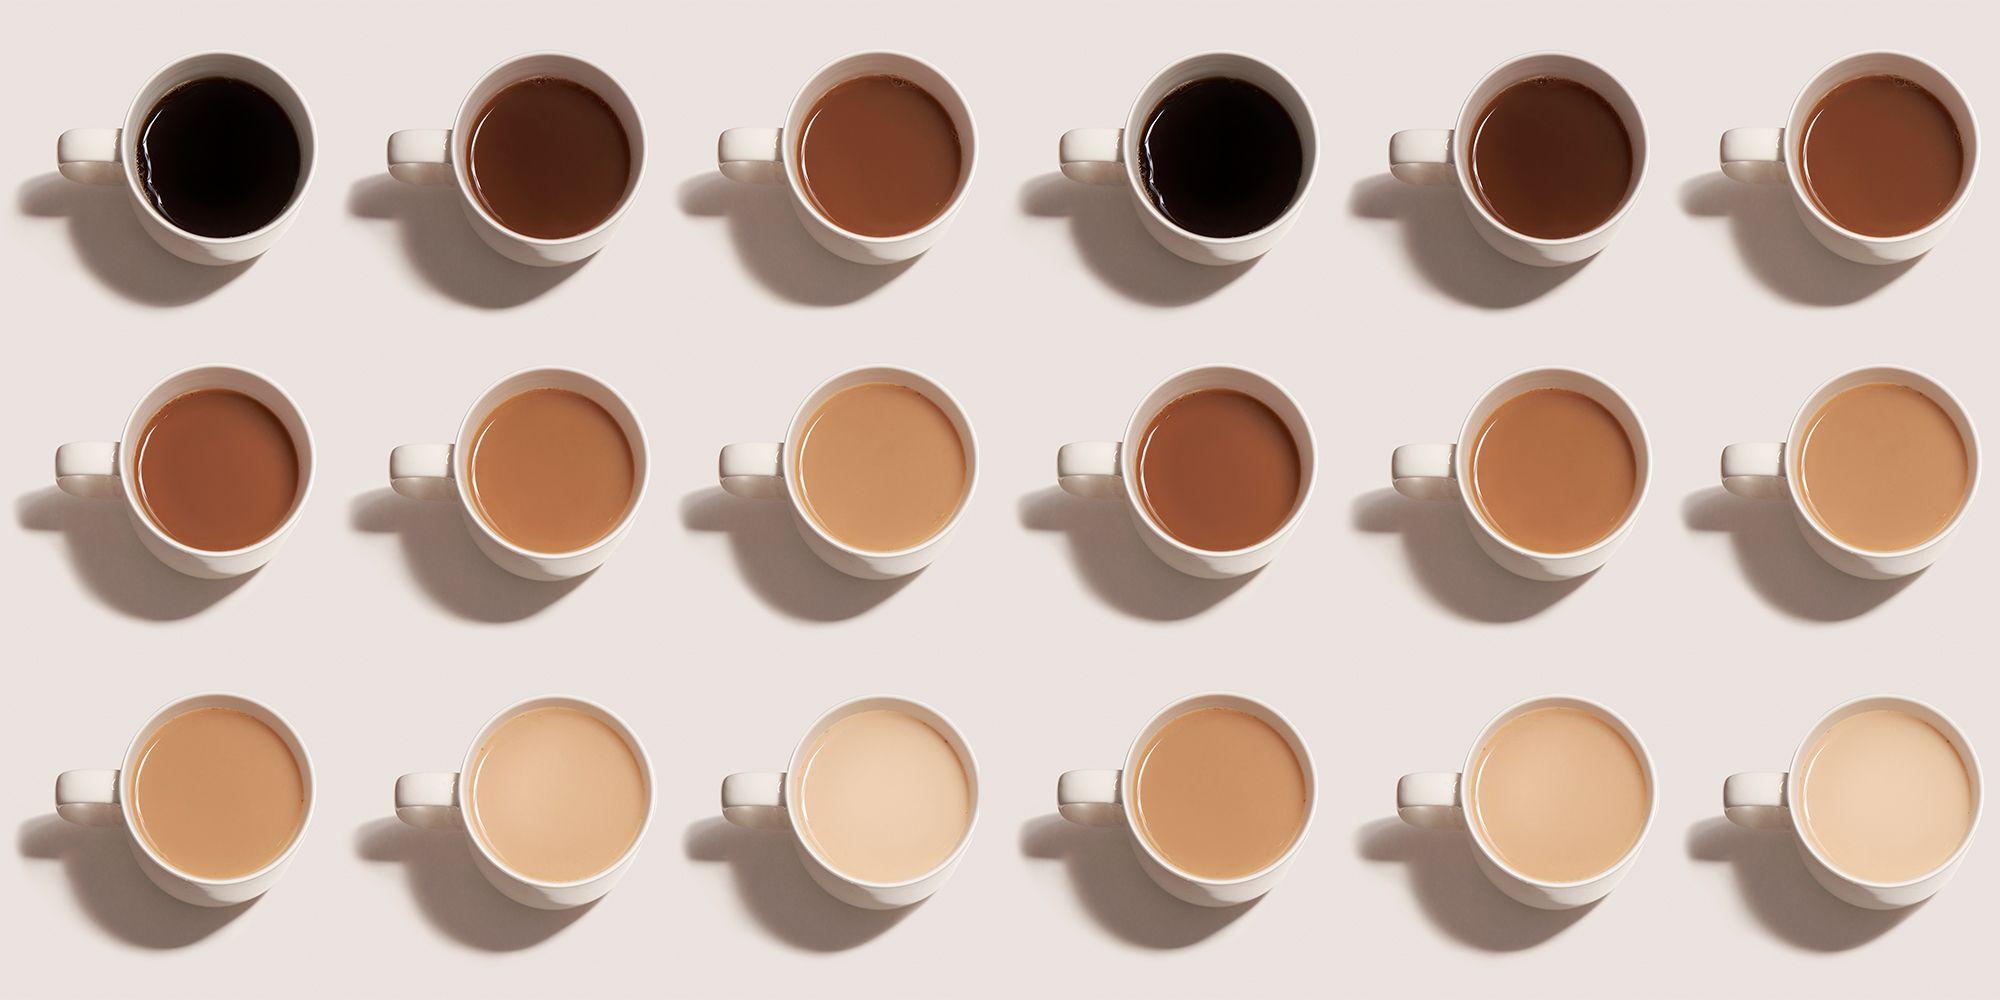 cafe irritable colon